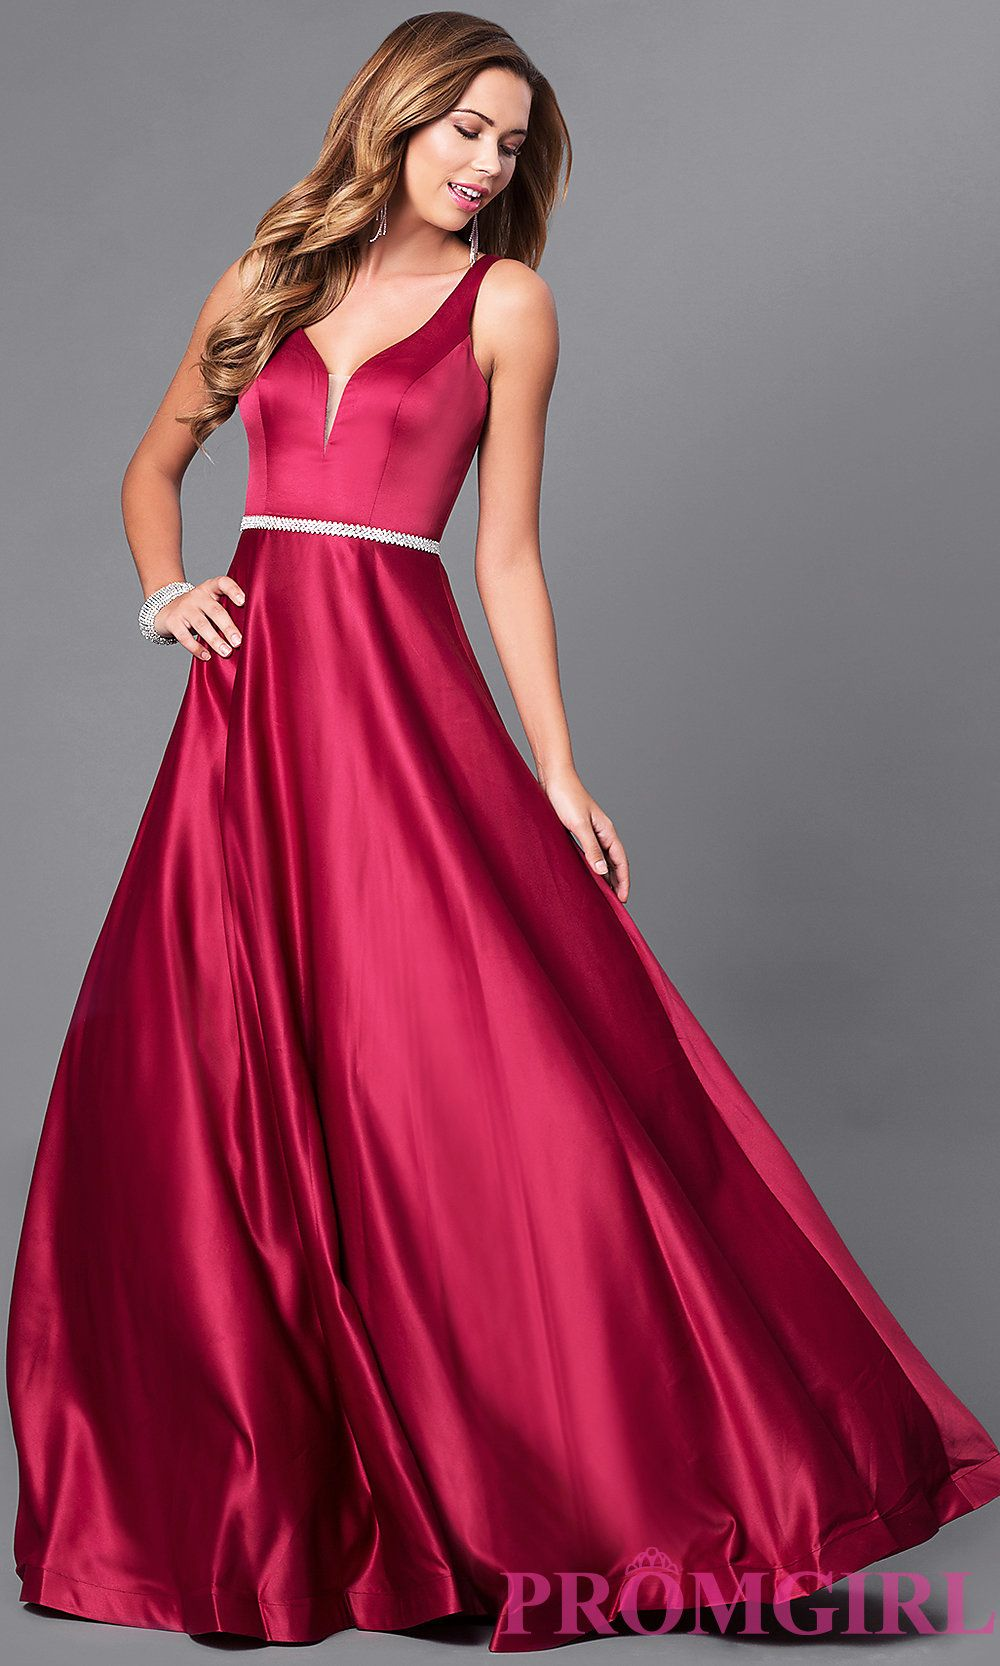 Prom beautiful dresses under 200 rare photo